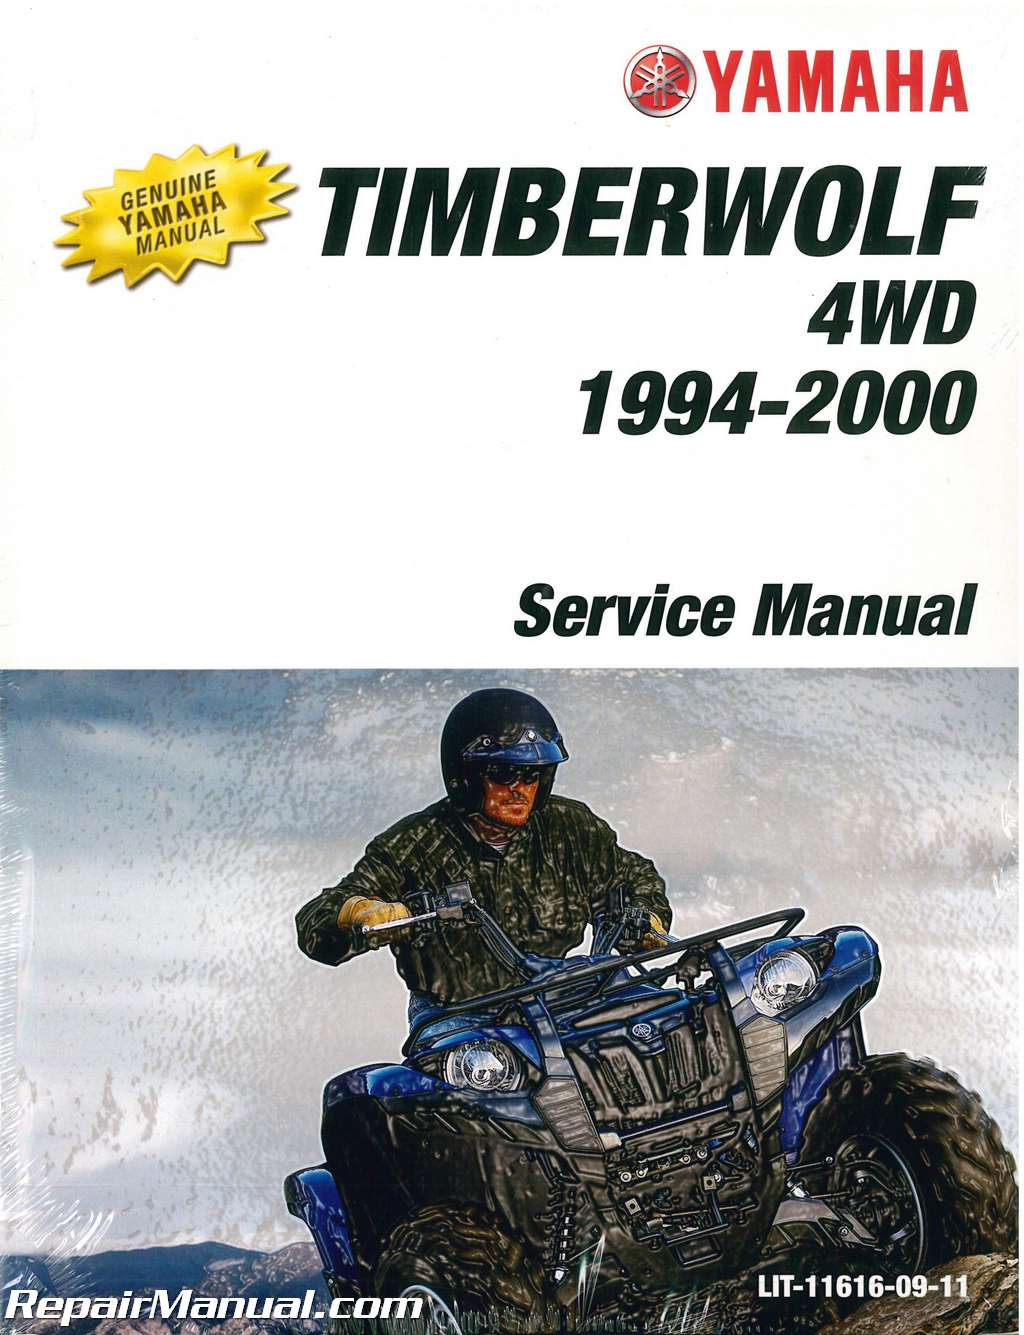 Yamaha Yfb250fwf Timberwolf Atv Service Manual